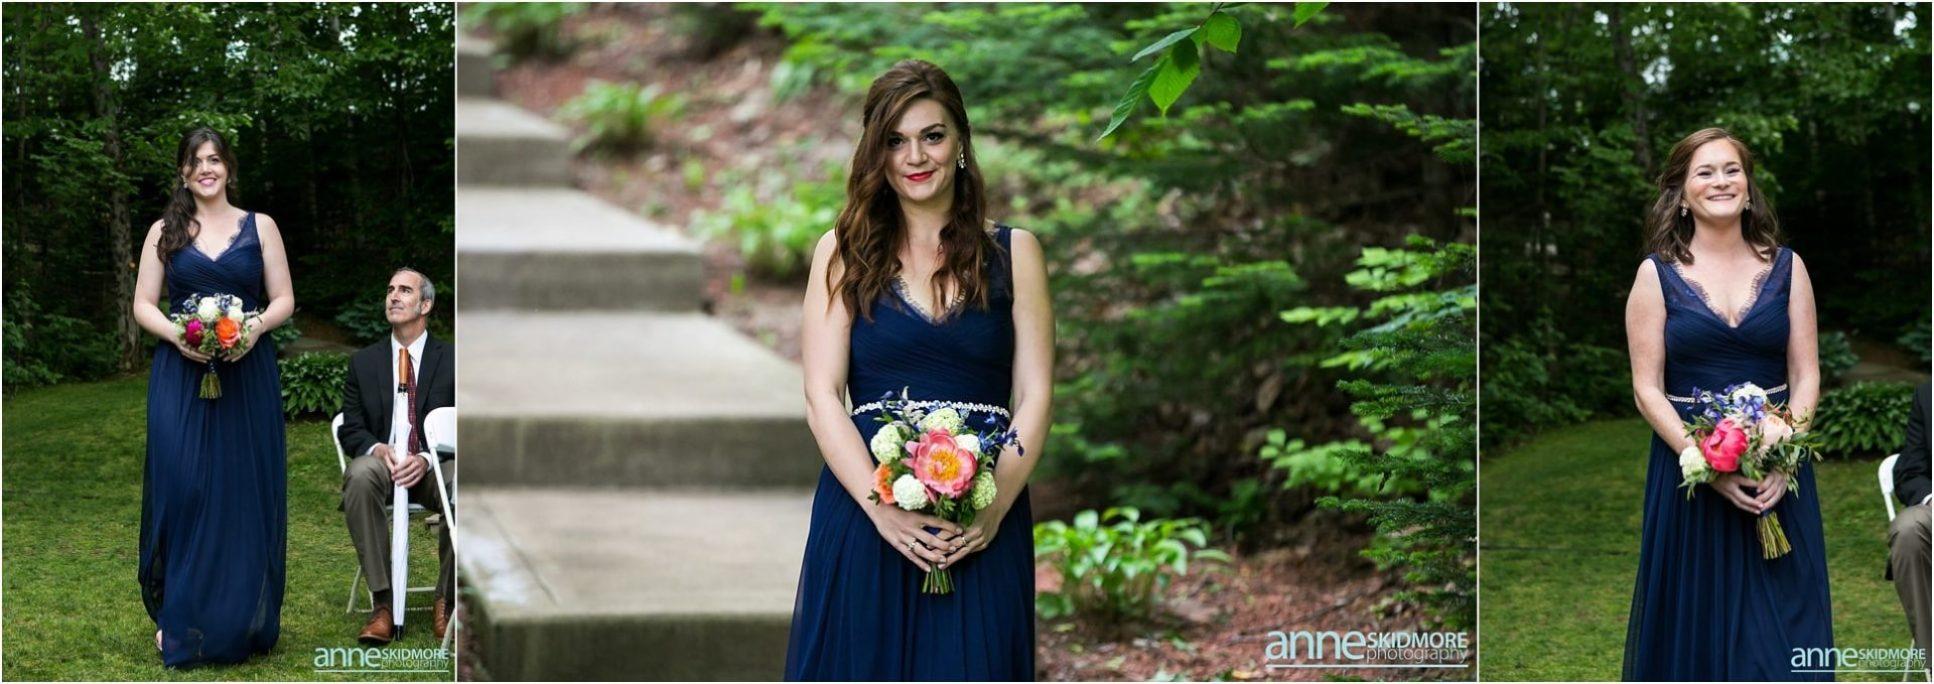 Eagle_Mountain_House_Wedding_0038